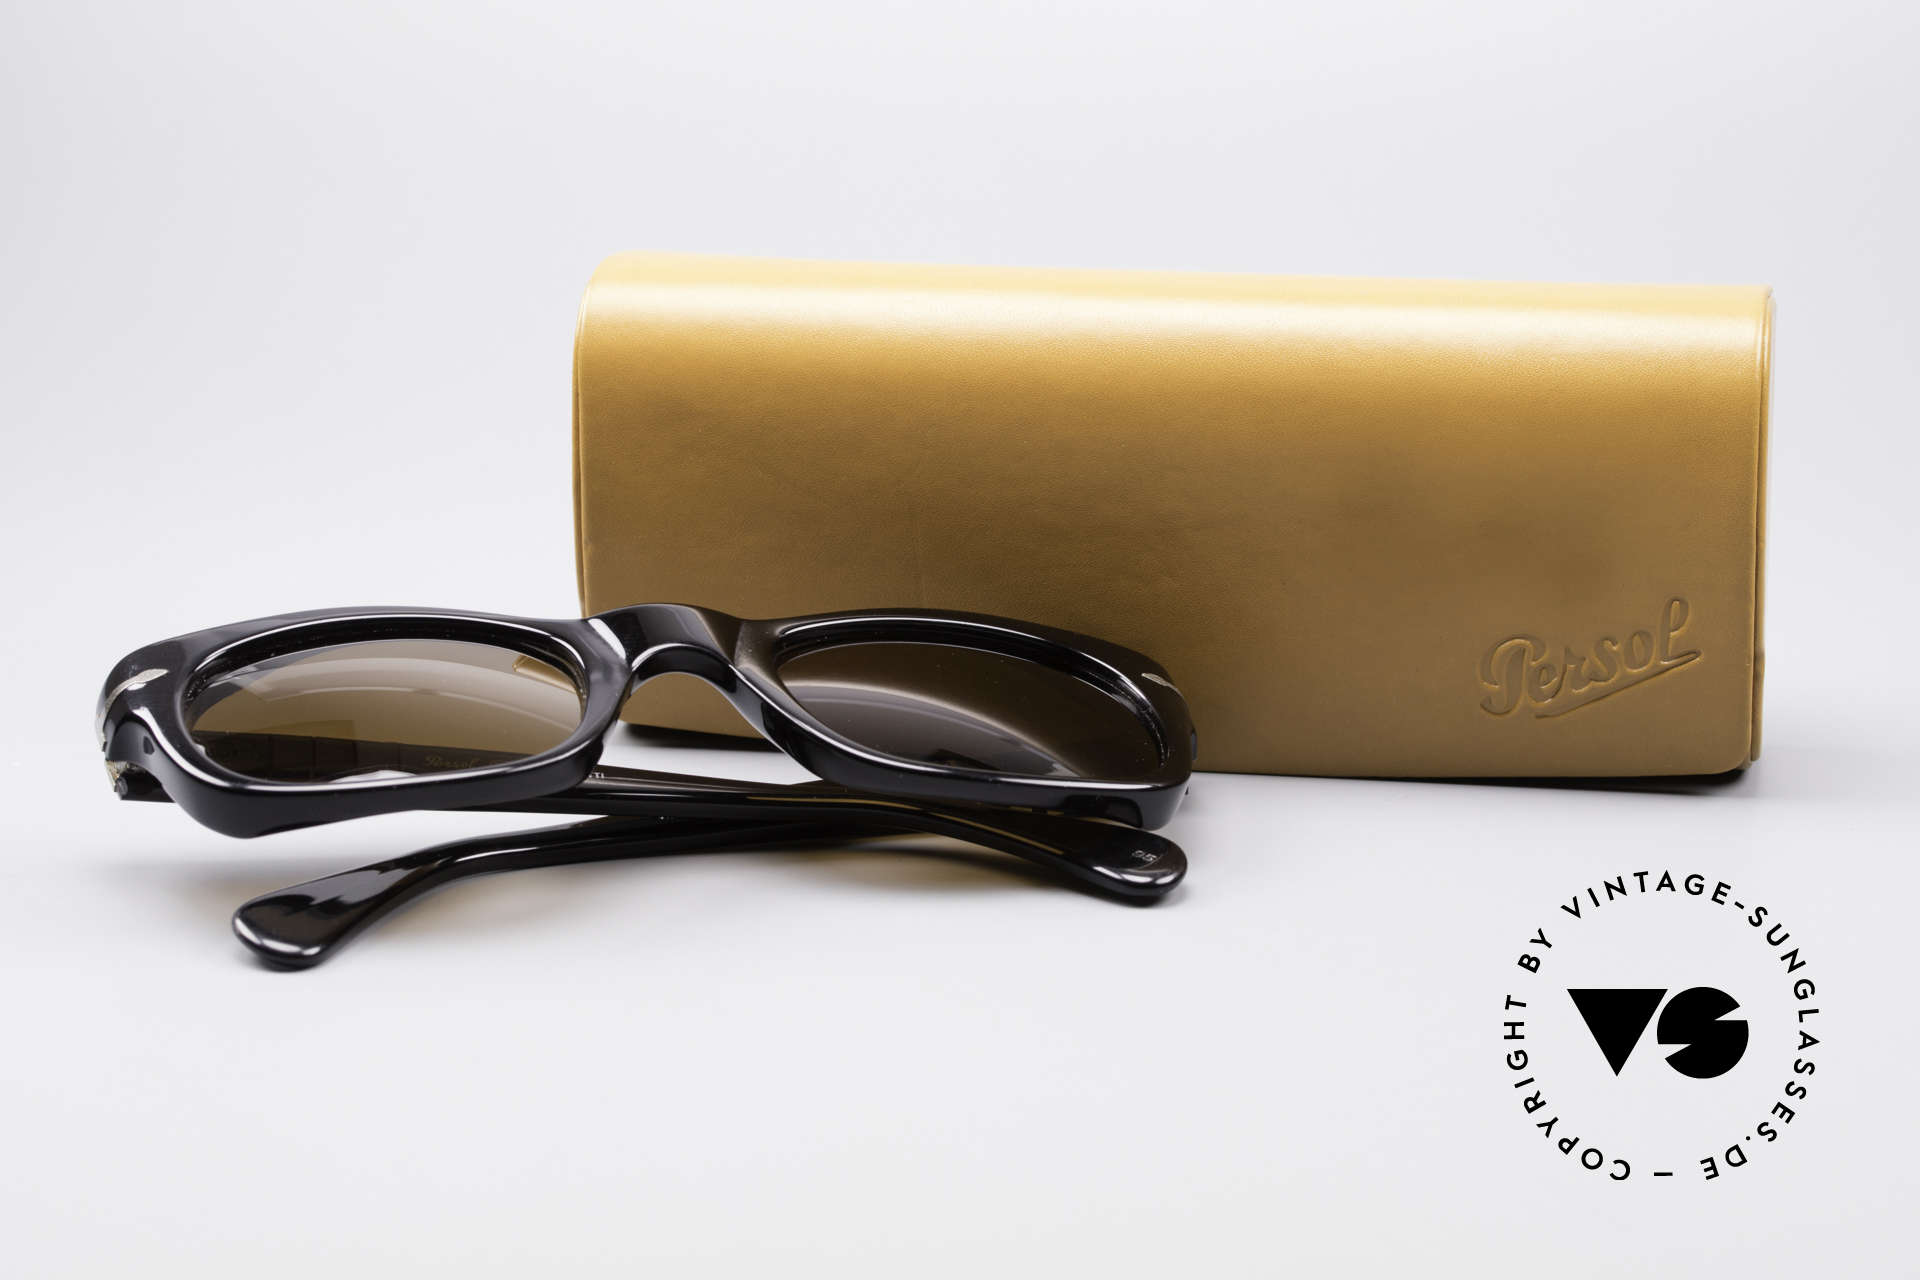 Persol 6201 Ratti Identic 69202 Ratti, Size: large, Made for Men